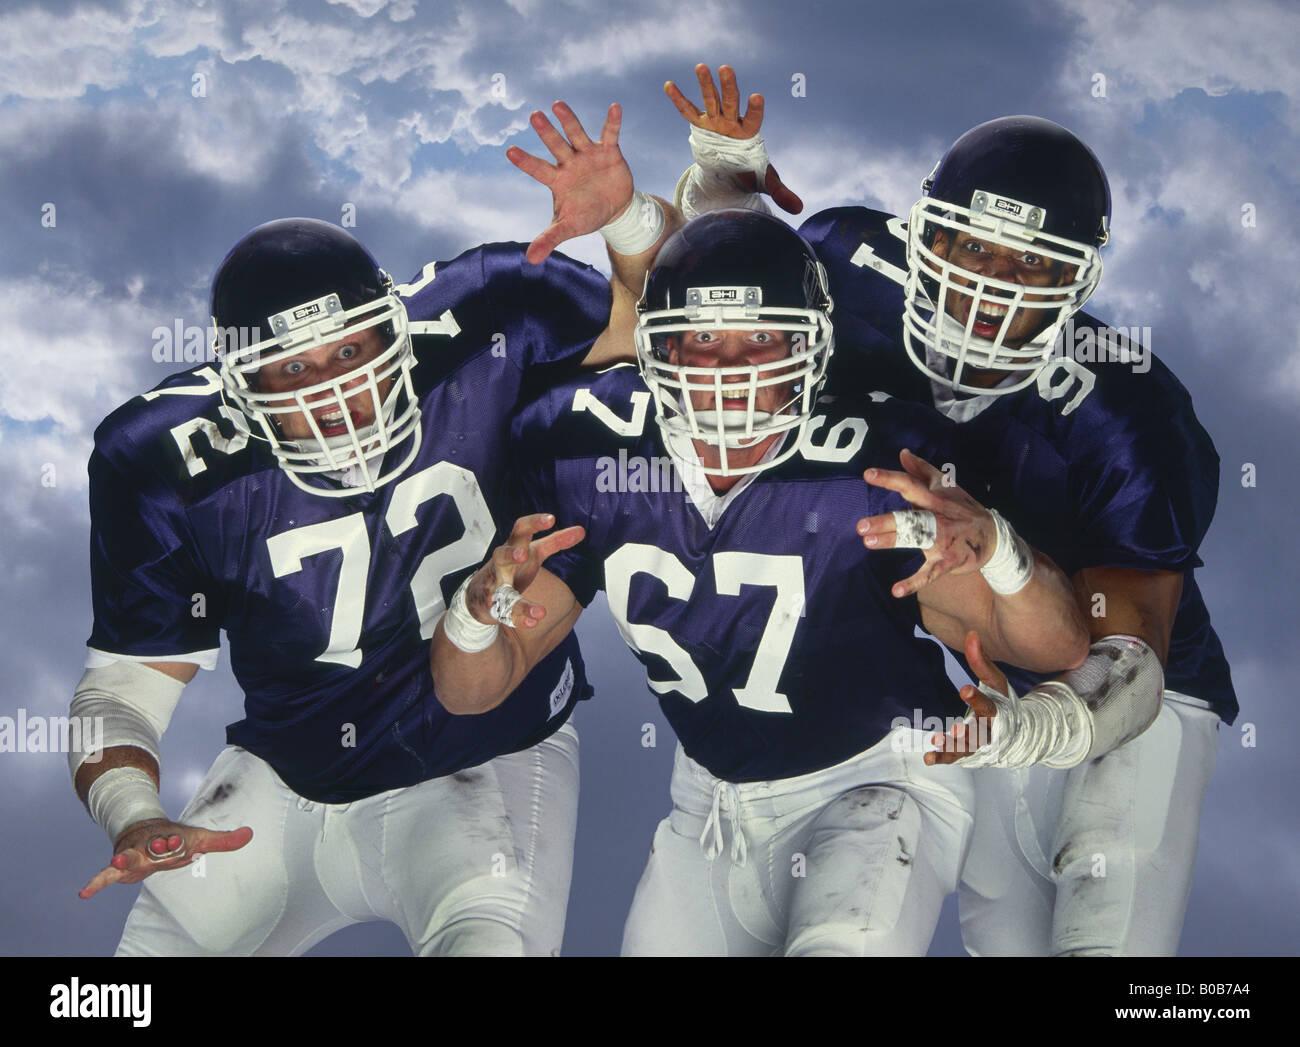 American football linesmen - Stock Image